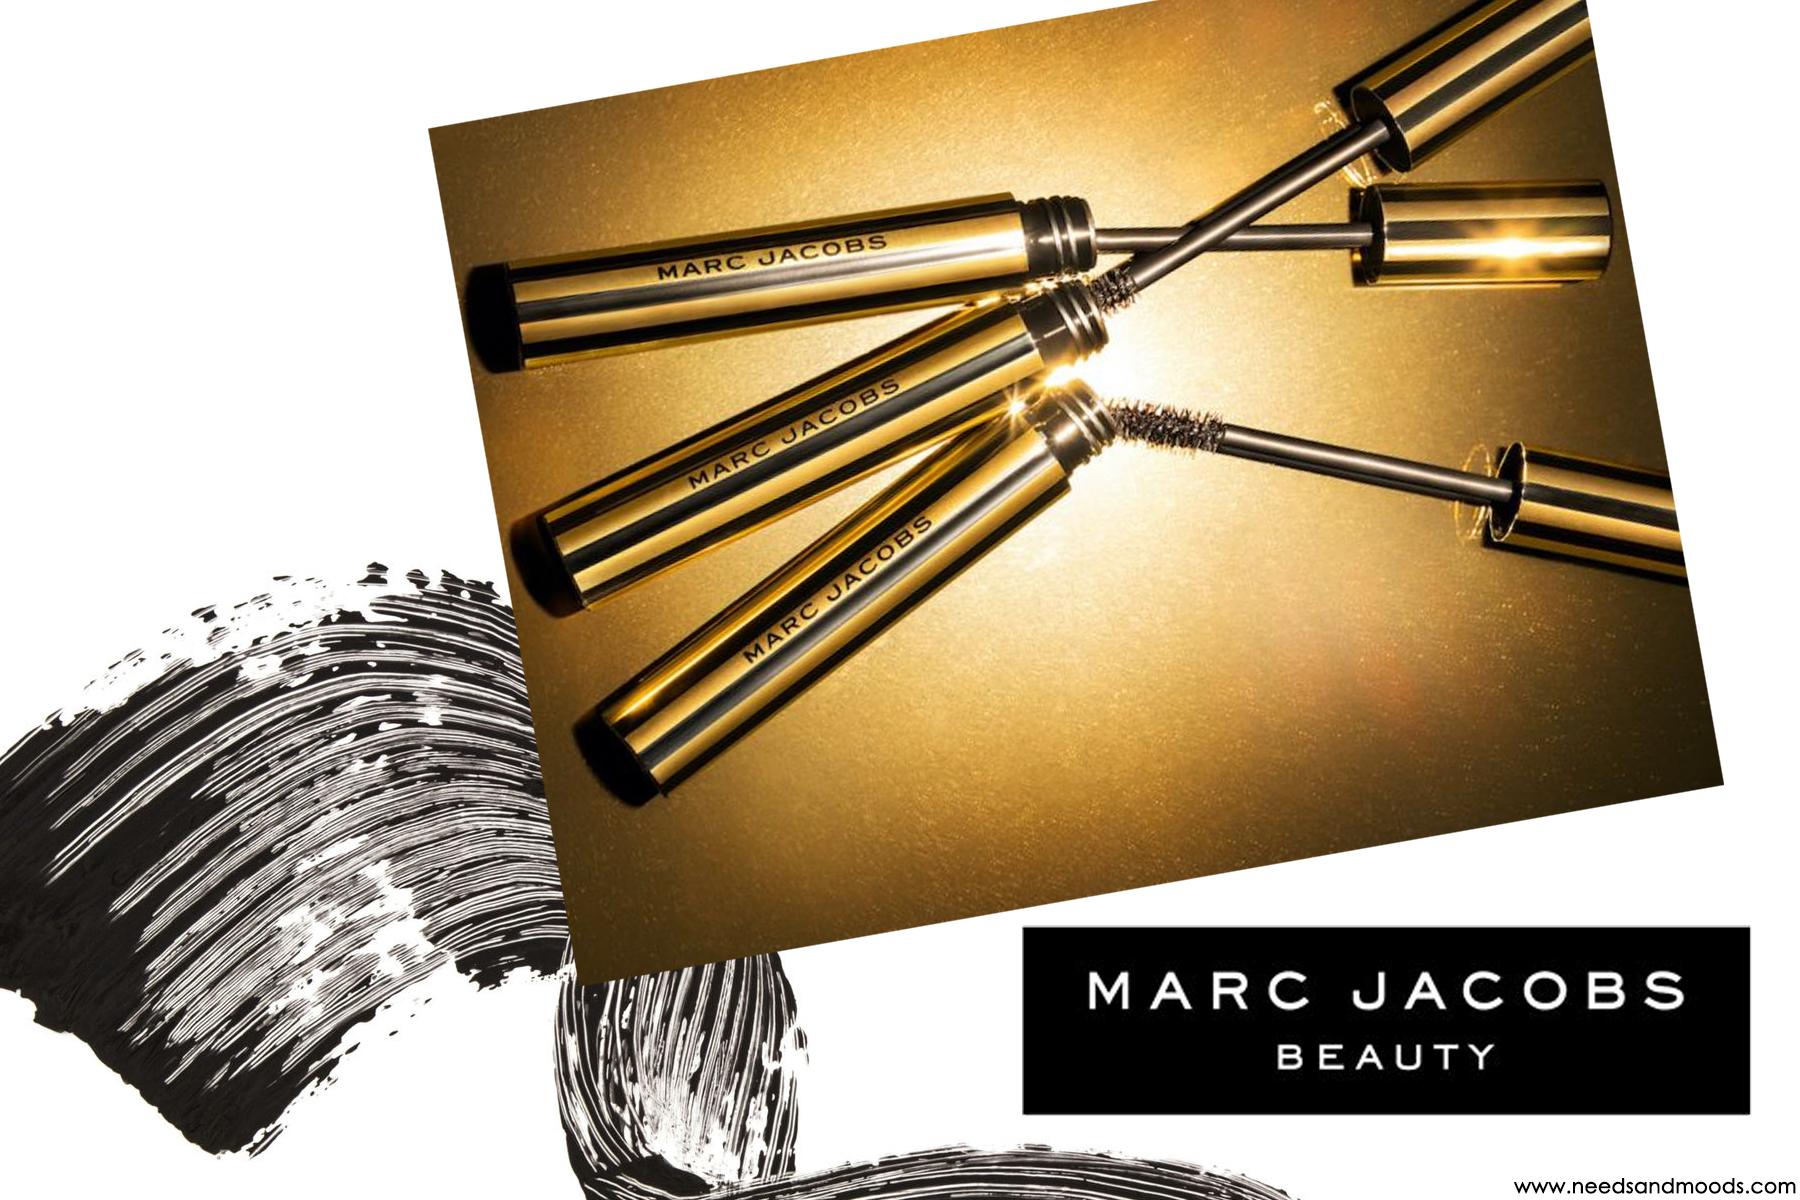 marc jacobs beauty at lash d mascara